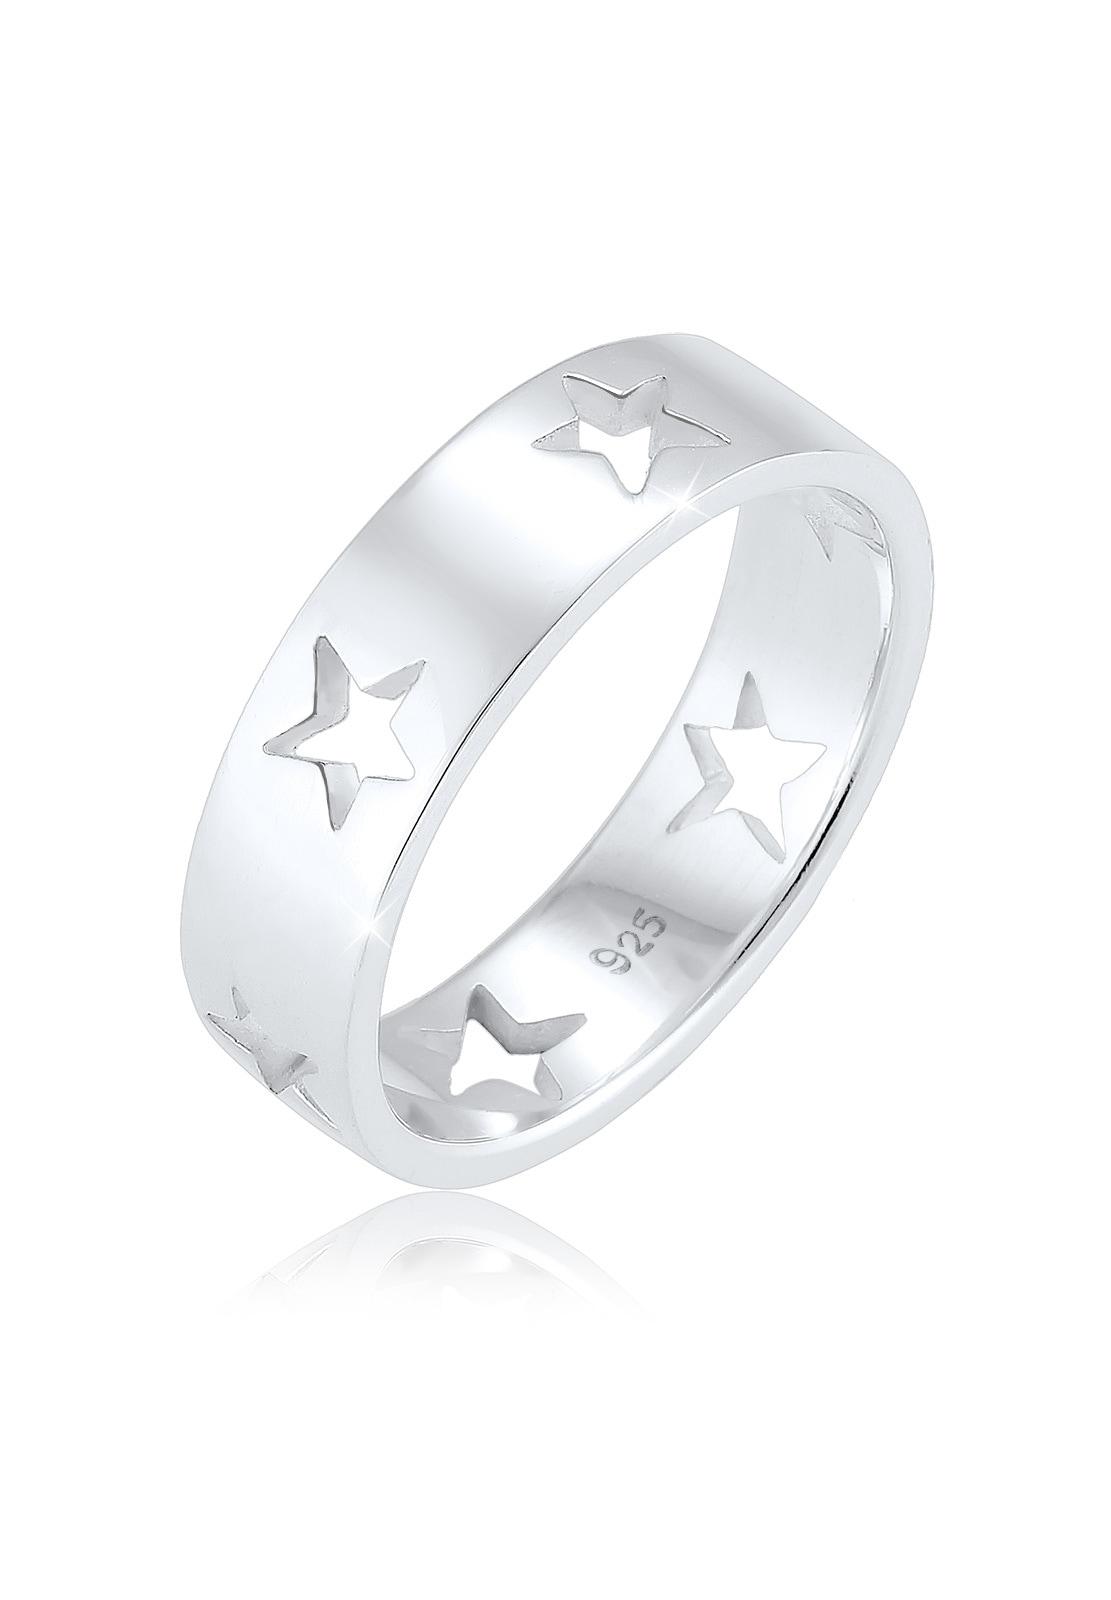 Elli Fingerring Sterne Astro Cut Out Bandring 925 Sterling Silber | Schmuck > Ringe > Fingerringe | Elli